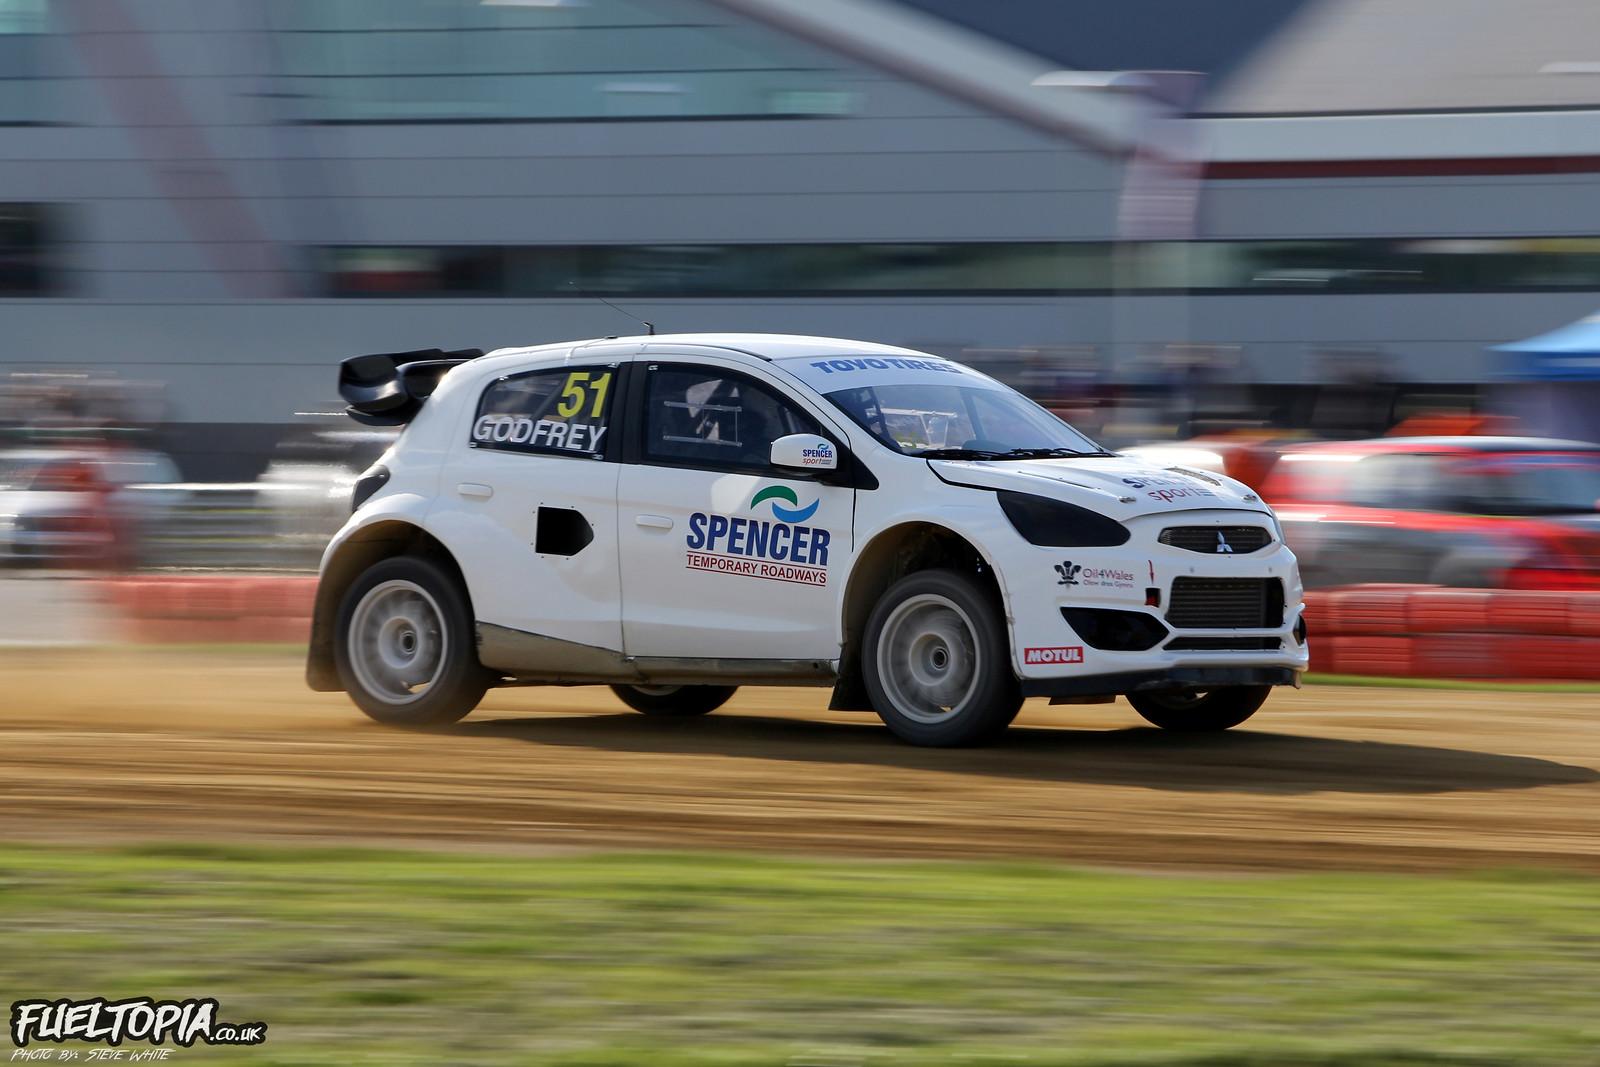 Julian Godfrey Mitsubishi Mirage Silverstone BRX British Rallycross Championship 2019 Steve White Fueltopia